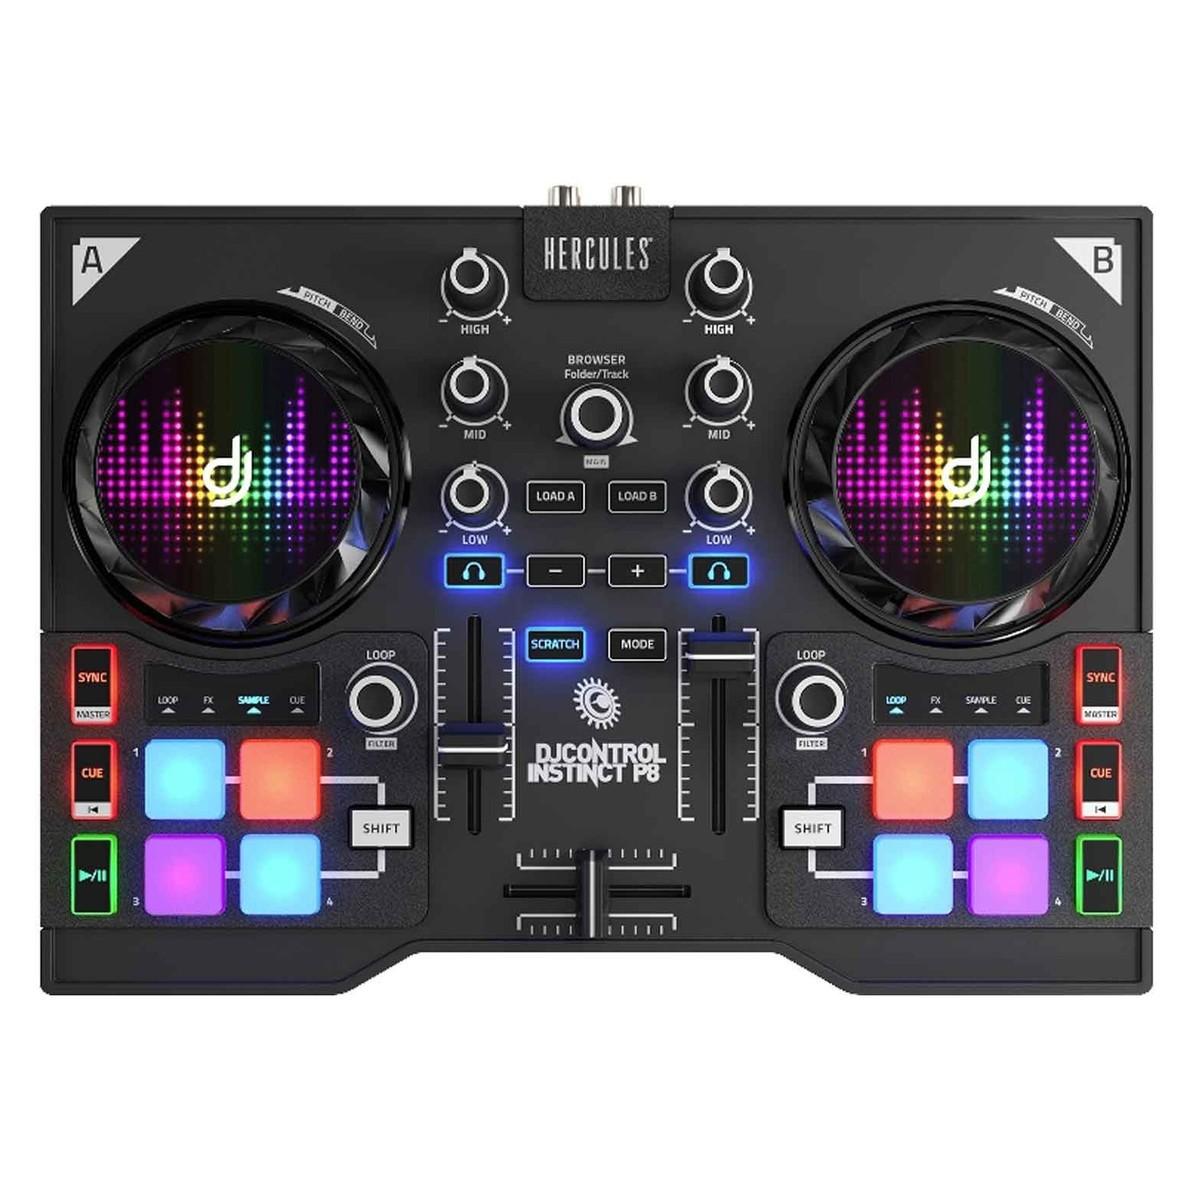 Image of Hercules DJ Control Instinct P8